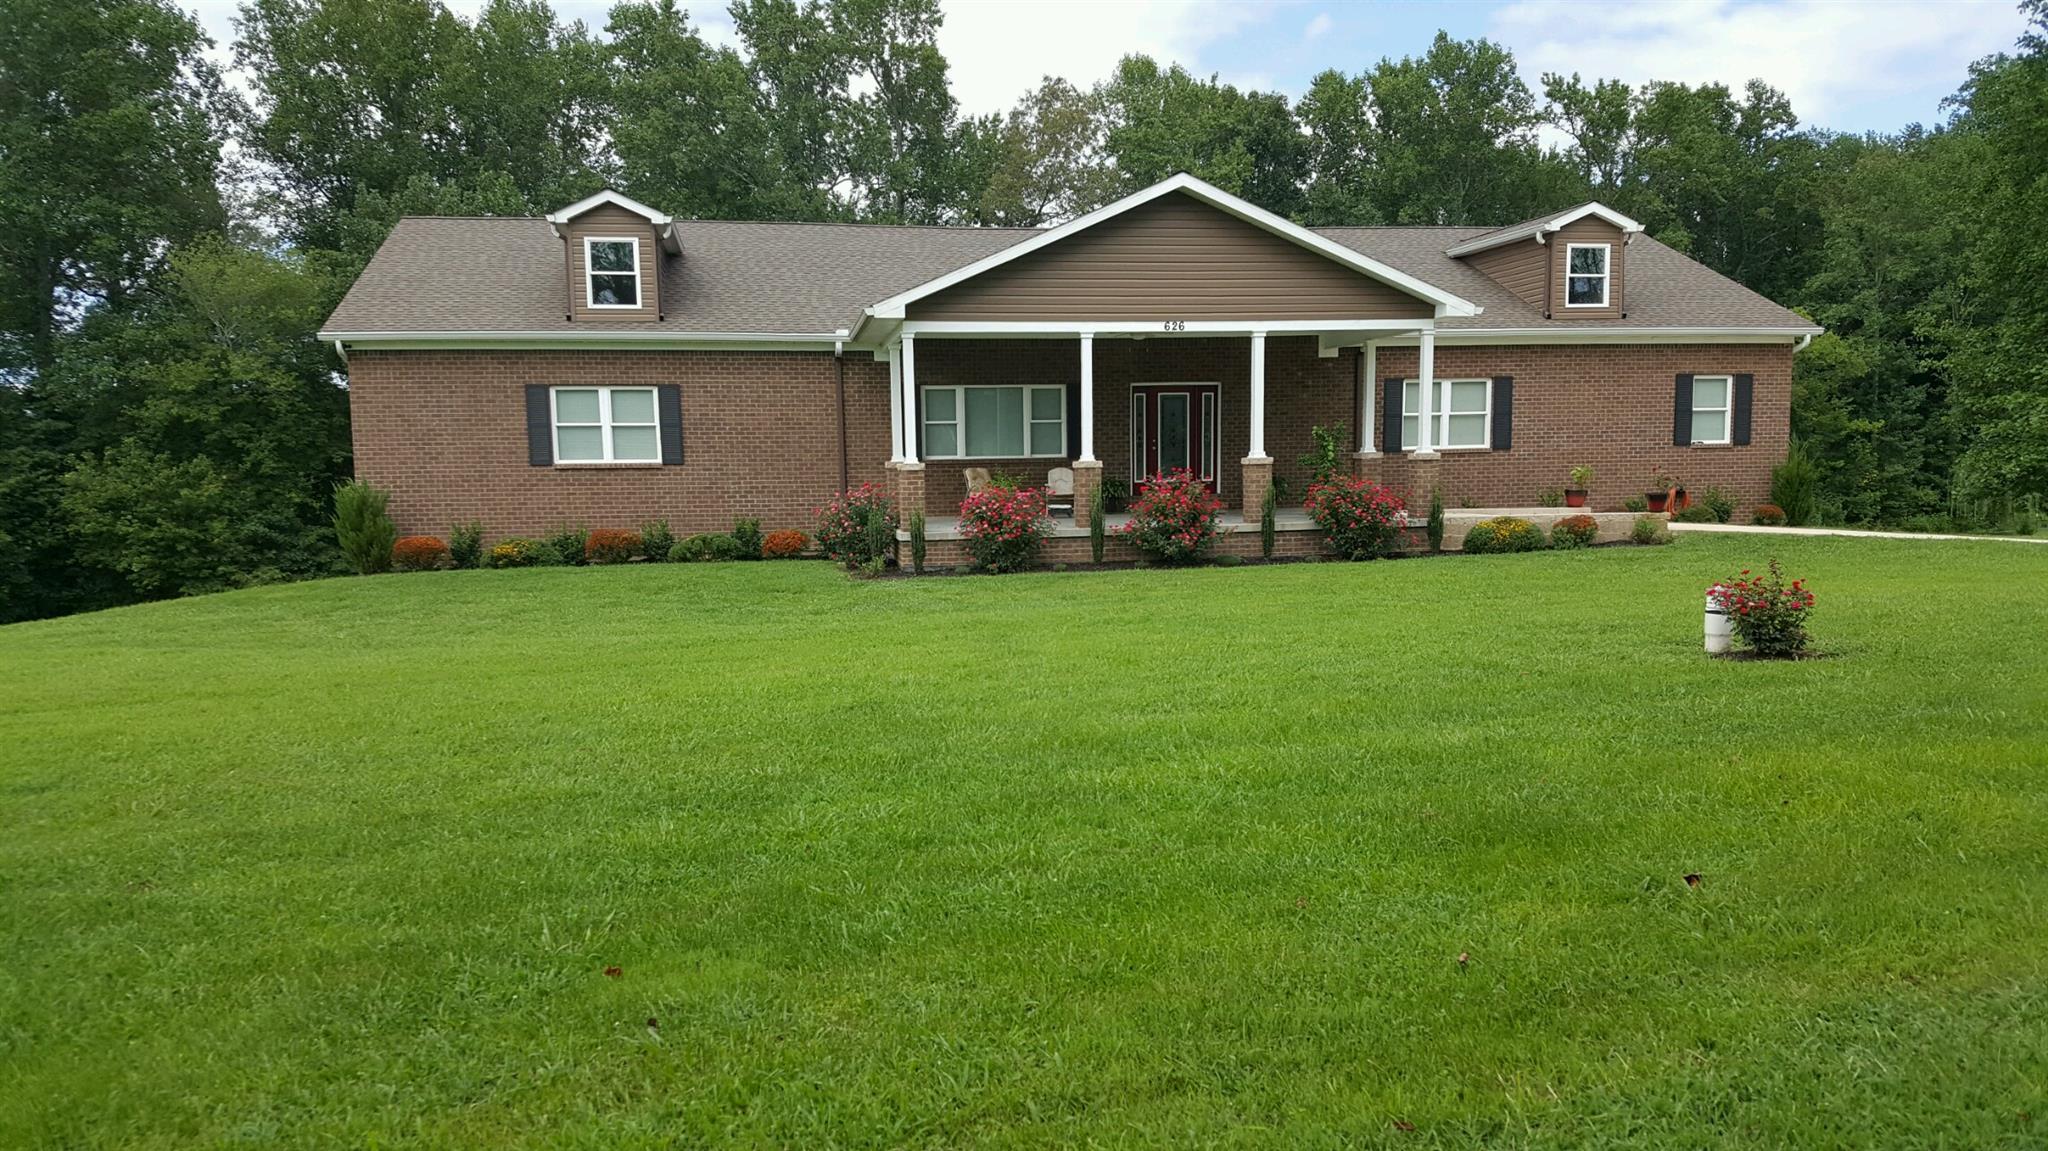 626 Oliver Smith Rd, Flintville, TN 37335